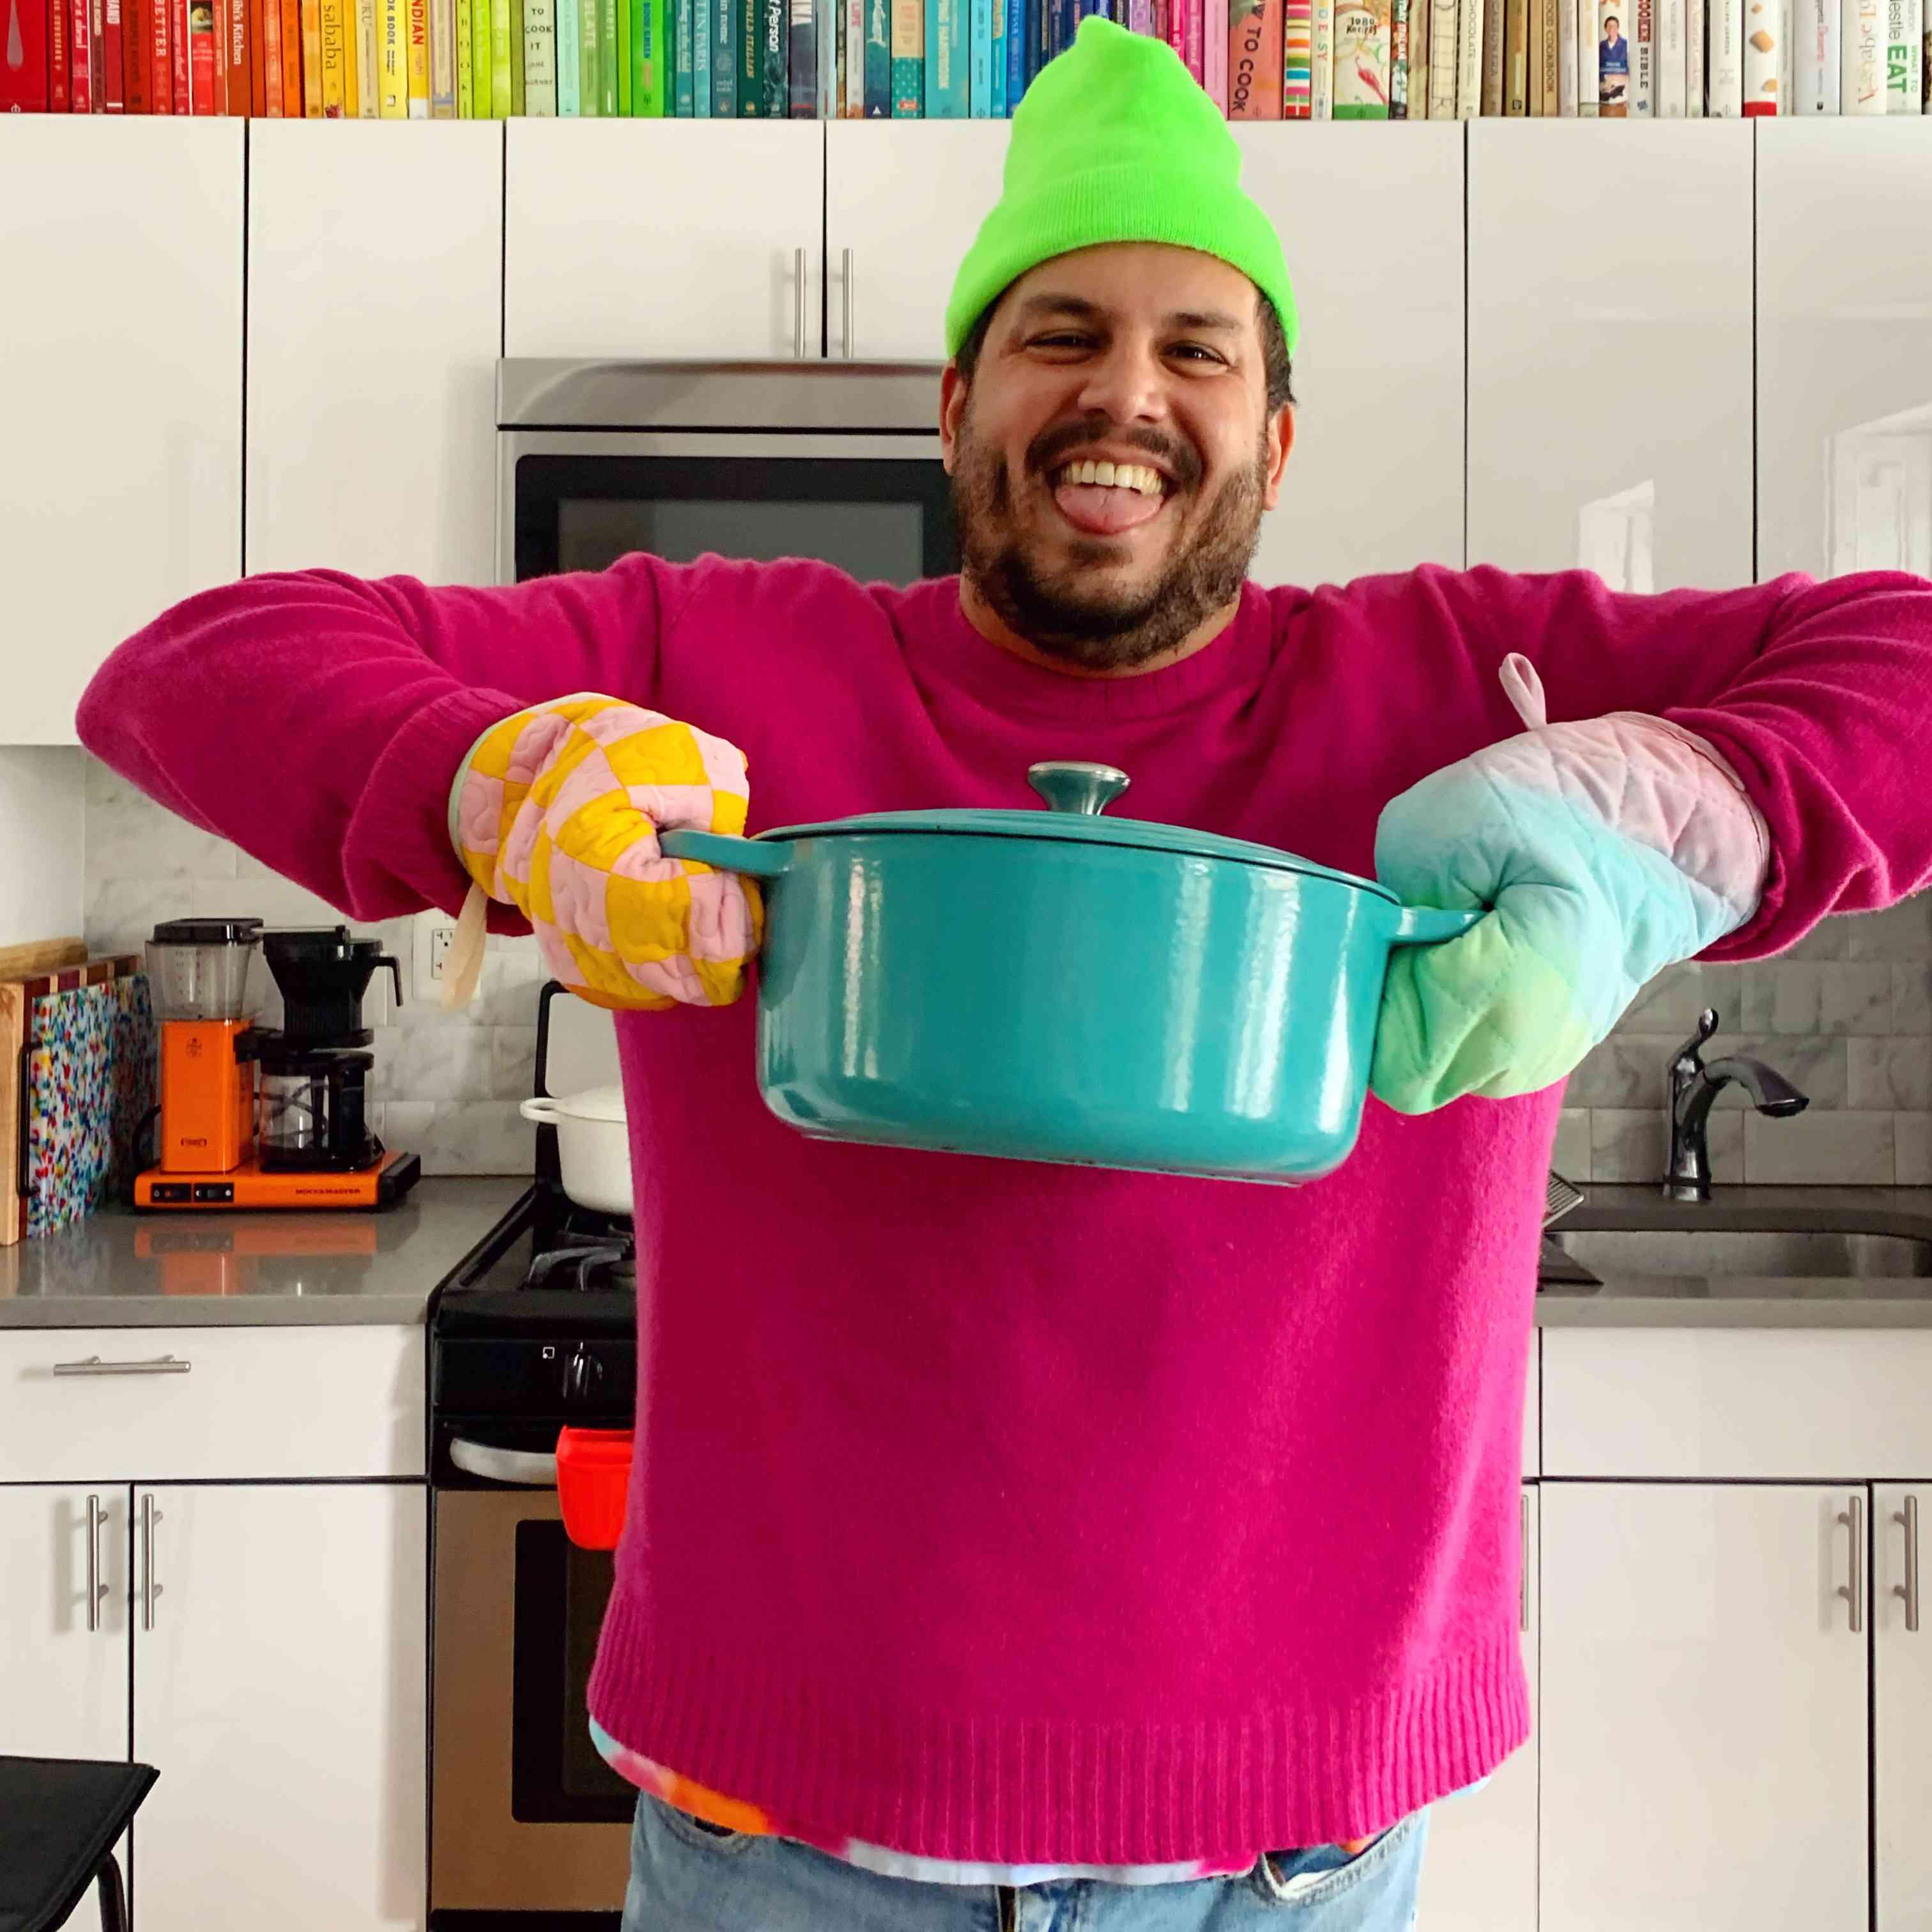 Daniel Pelosi cooking with the unicorn oven mitt.